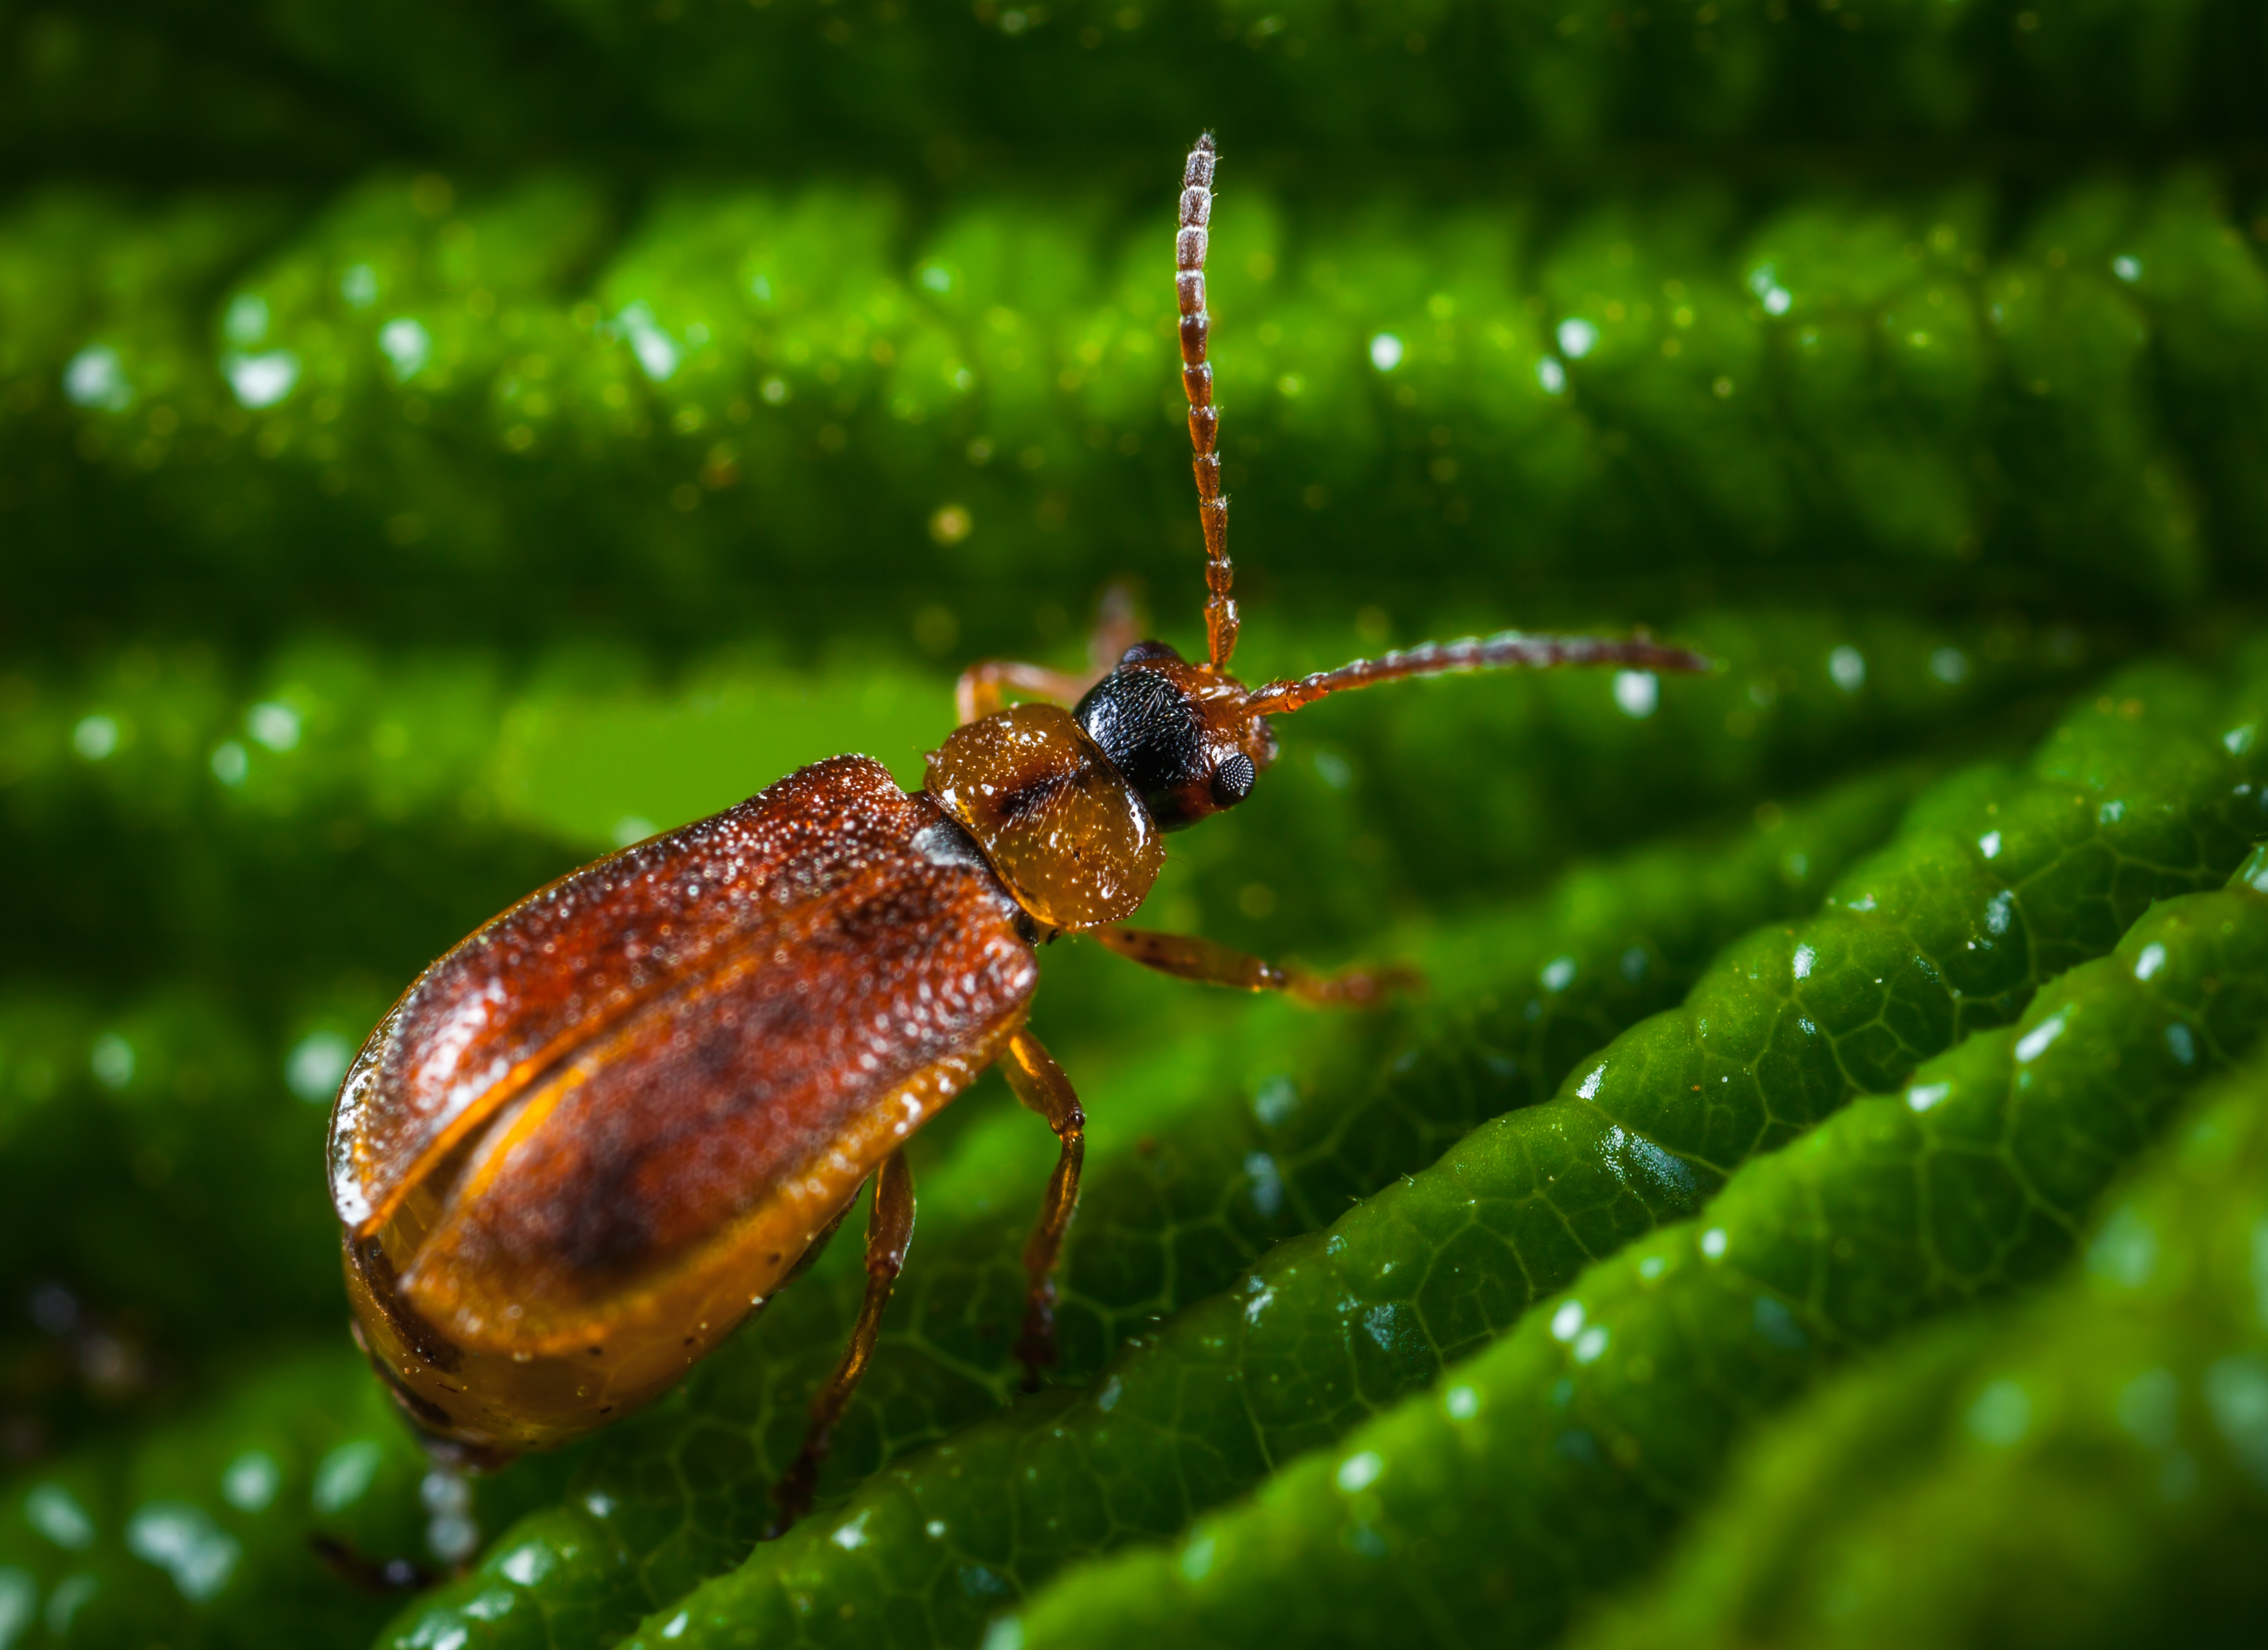 Brown Blister Beetle, Animal, Invertebrate, Wildlife, Wild, HQ Photo